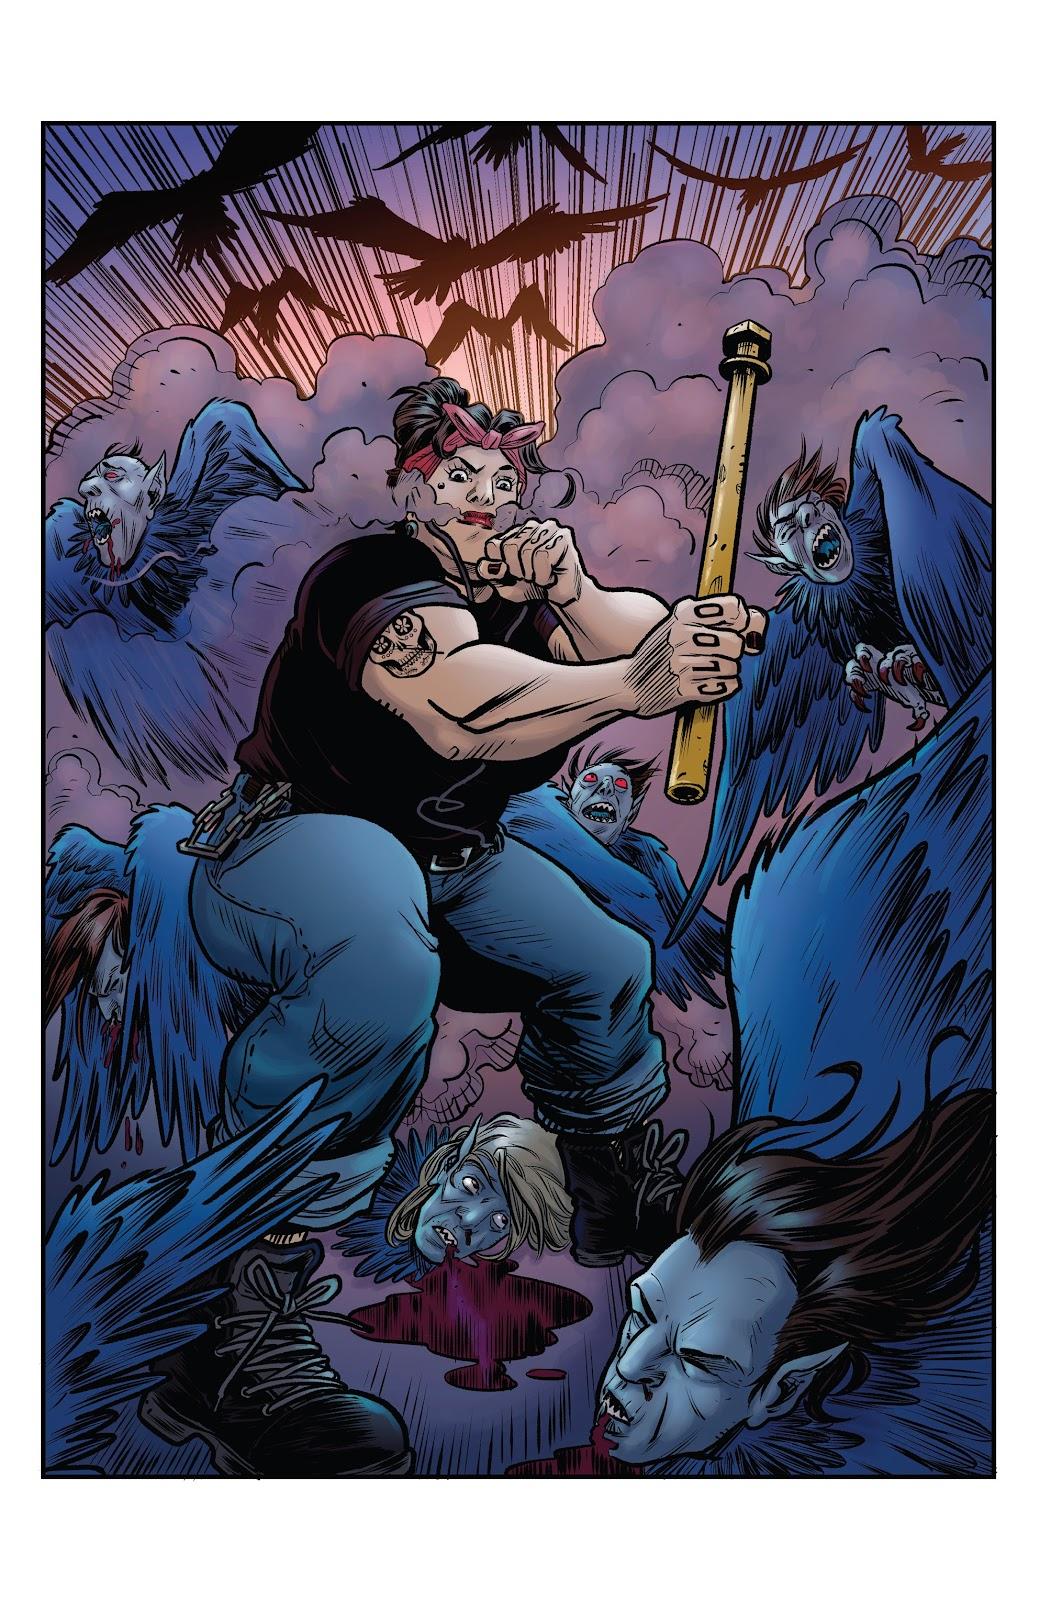 Read online Black Betty comic -  Issue #8 - 15